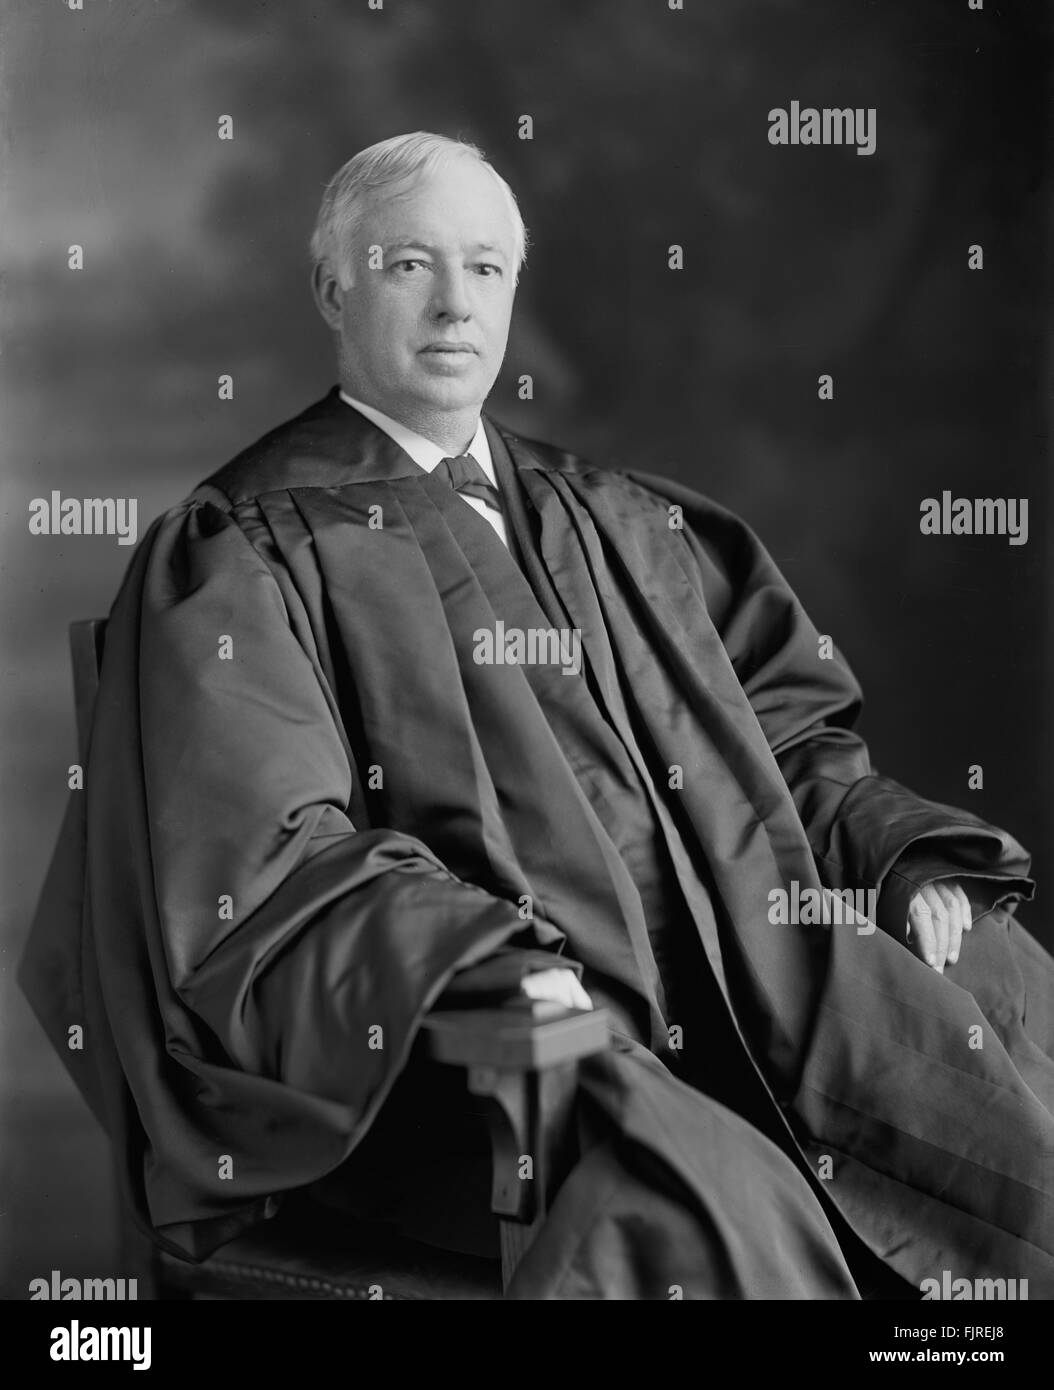 Joseph Rucker Lamar, Associate Justice of the U.S. Supreme Court, Portrait, circa 1915 - Stock Image